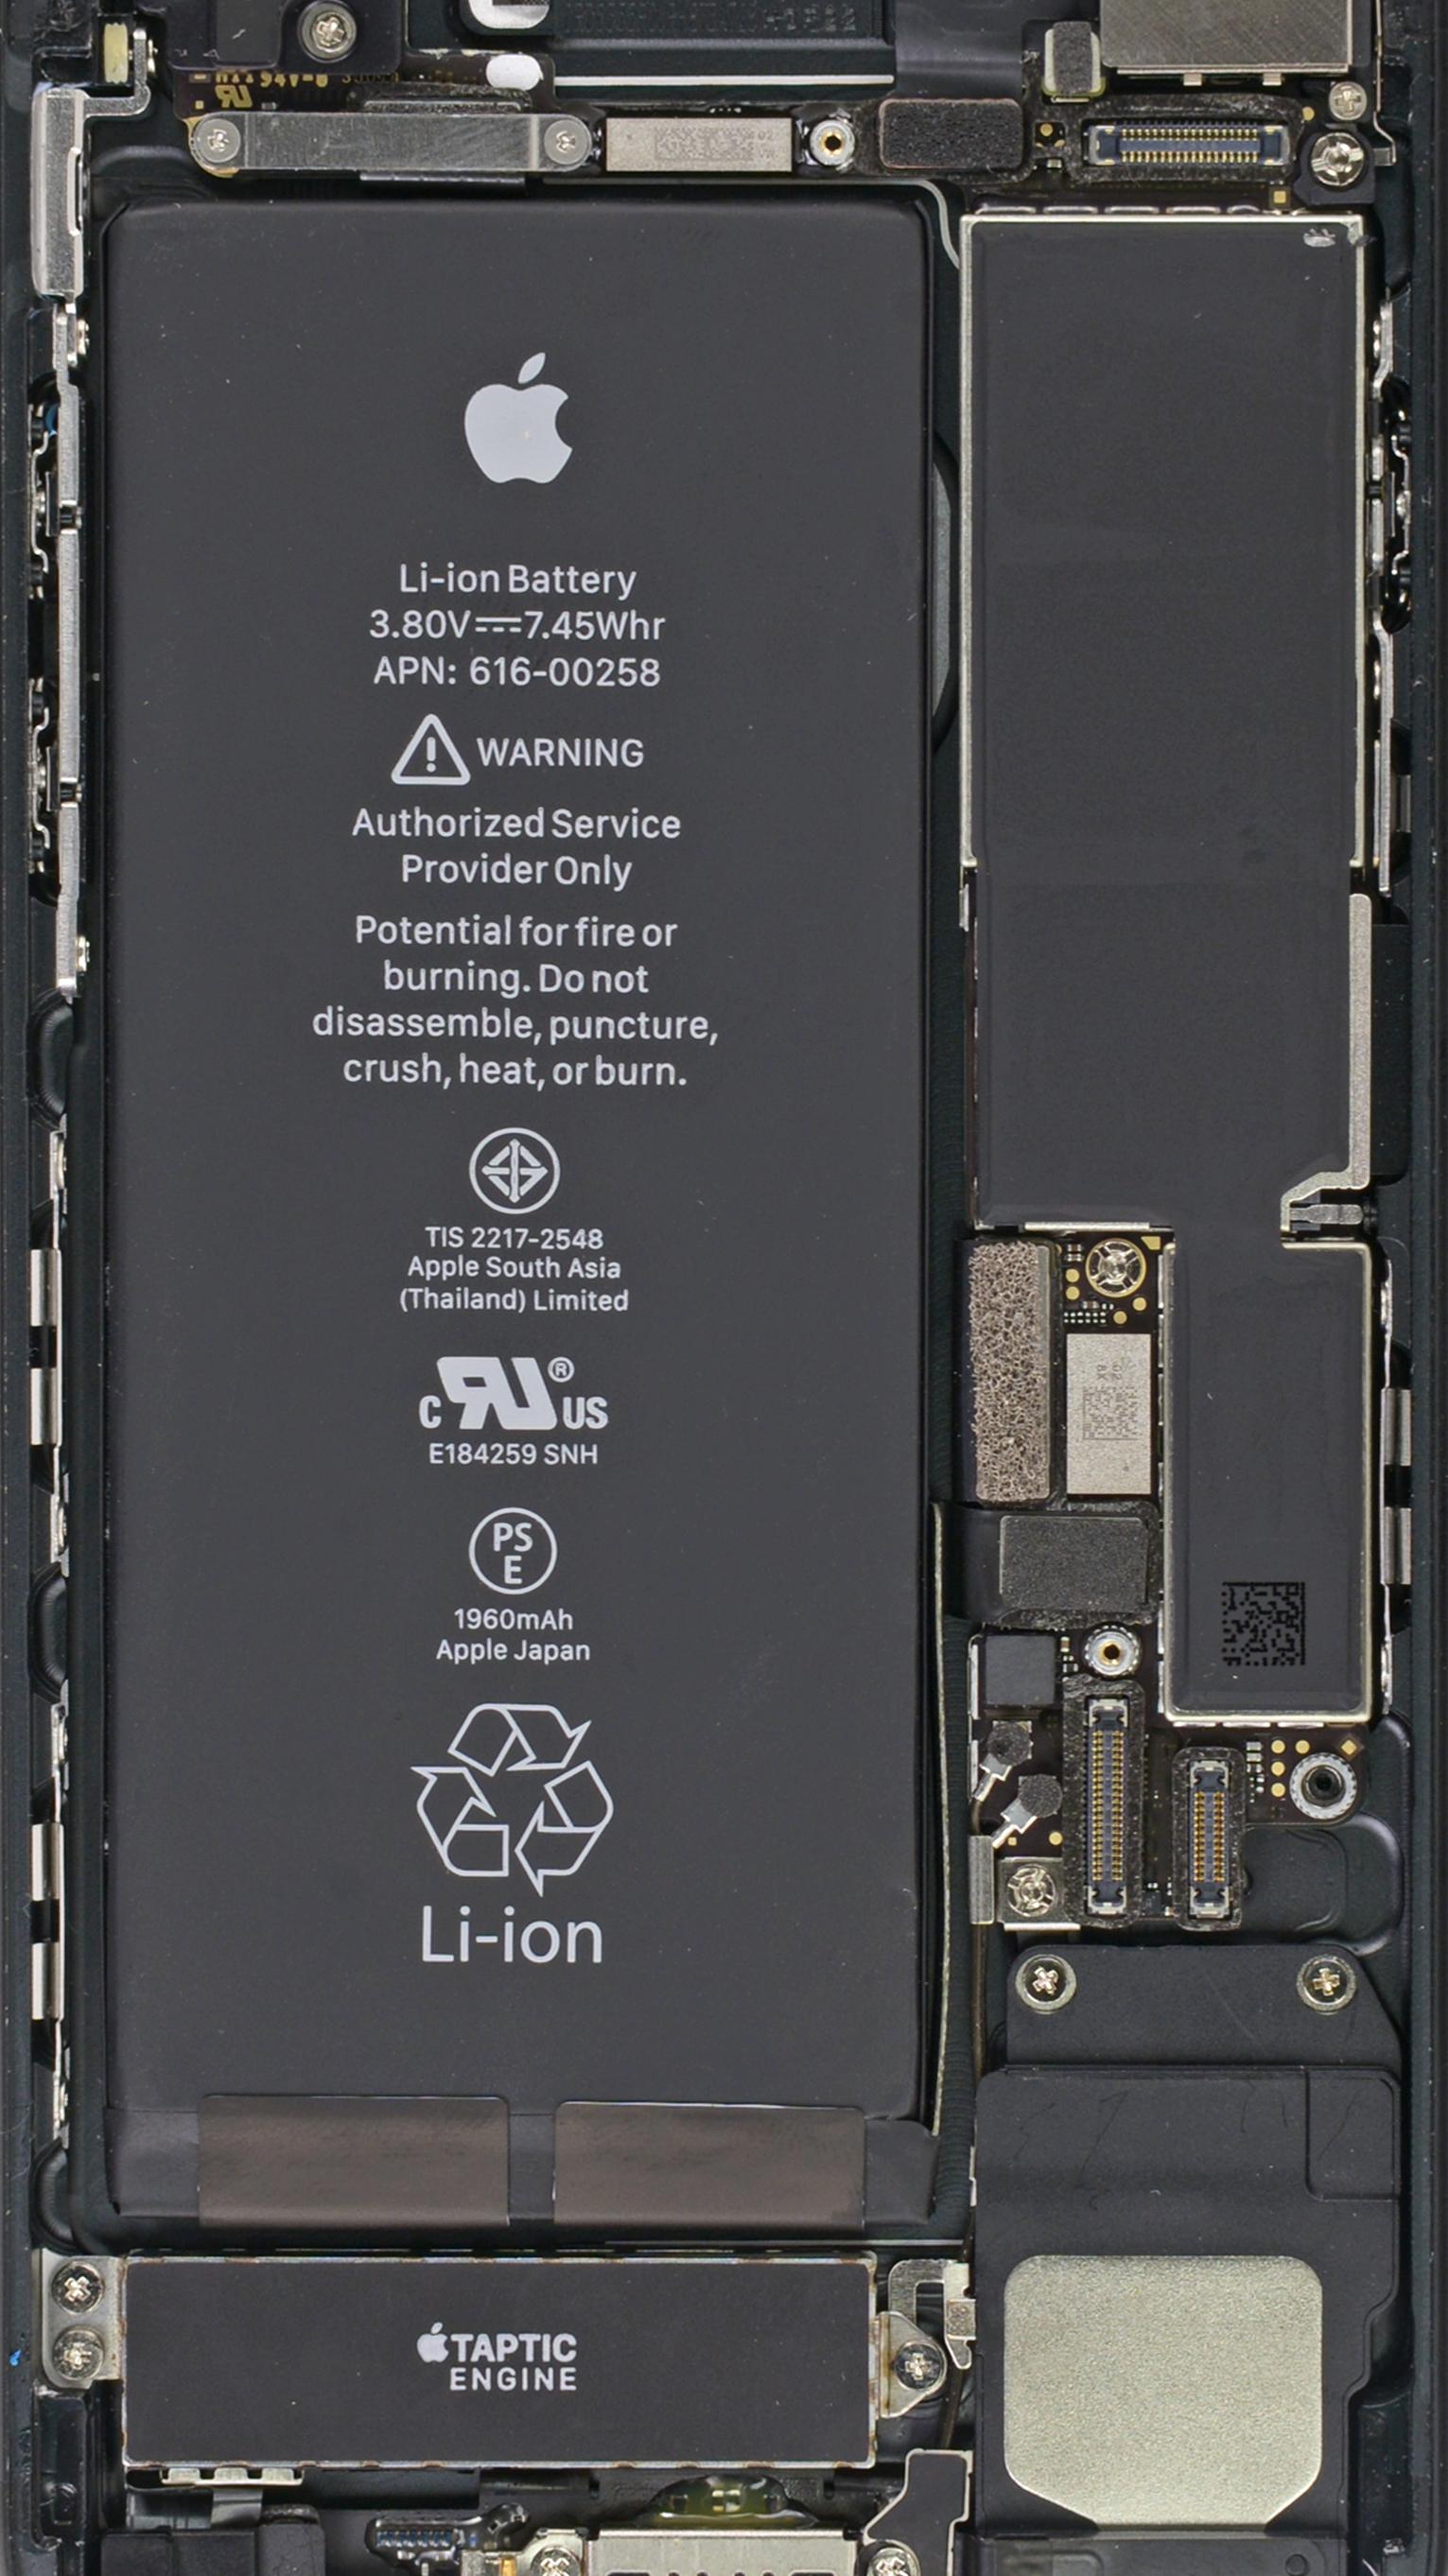 Wallpaper raio X do iPhone 7